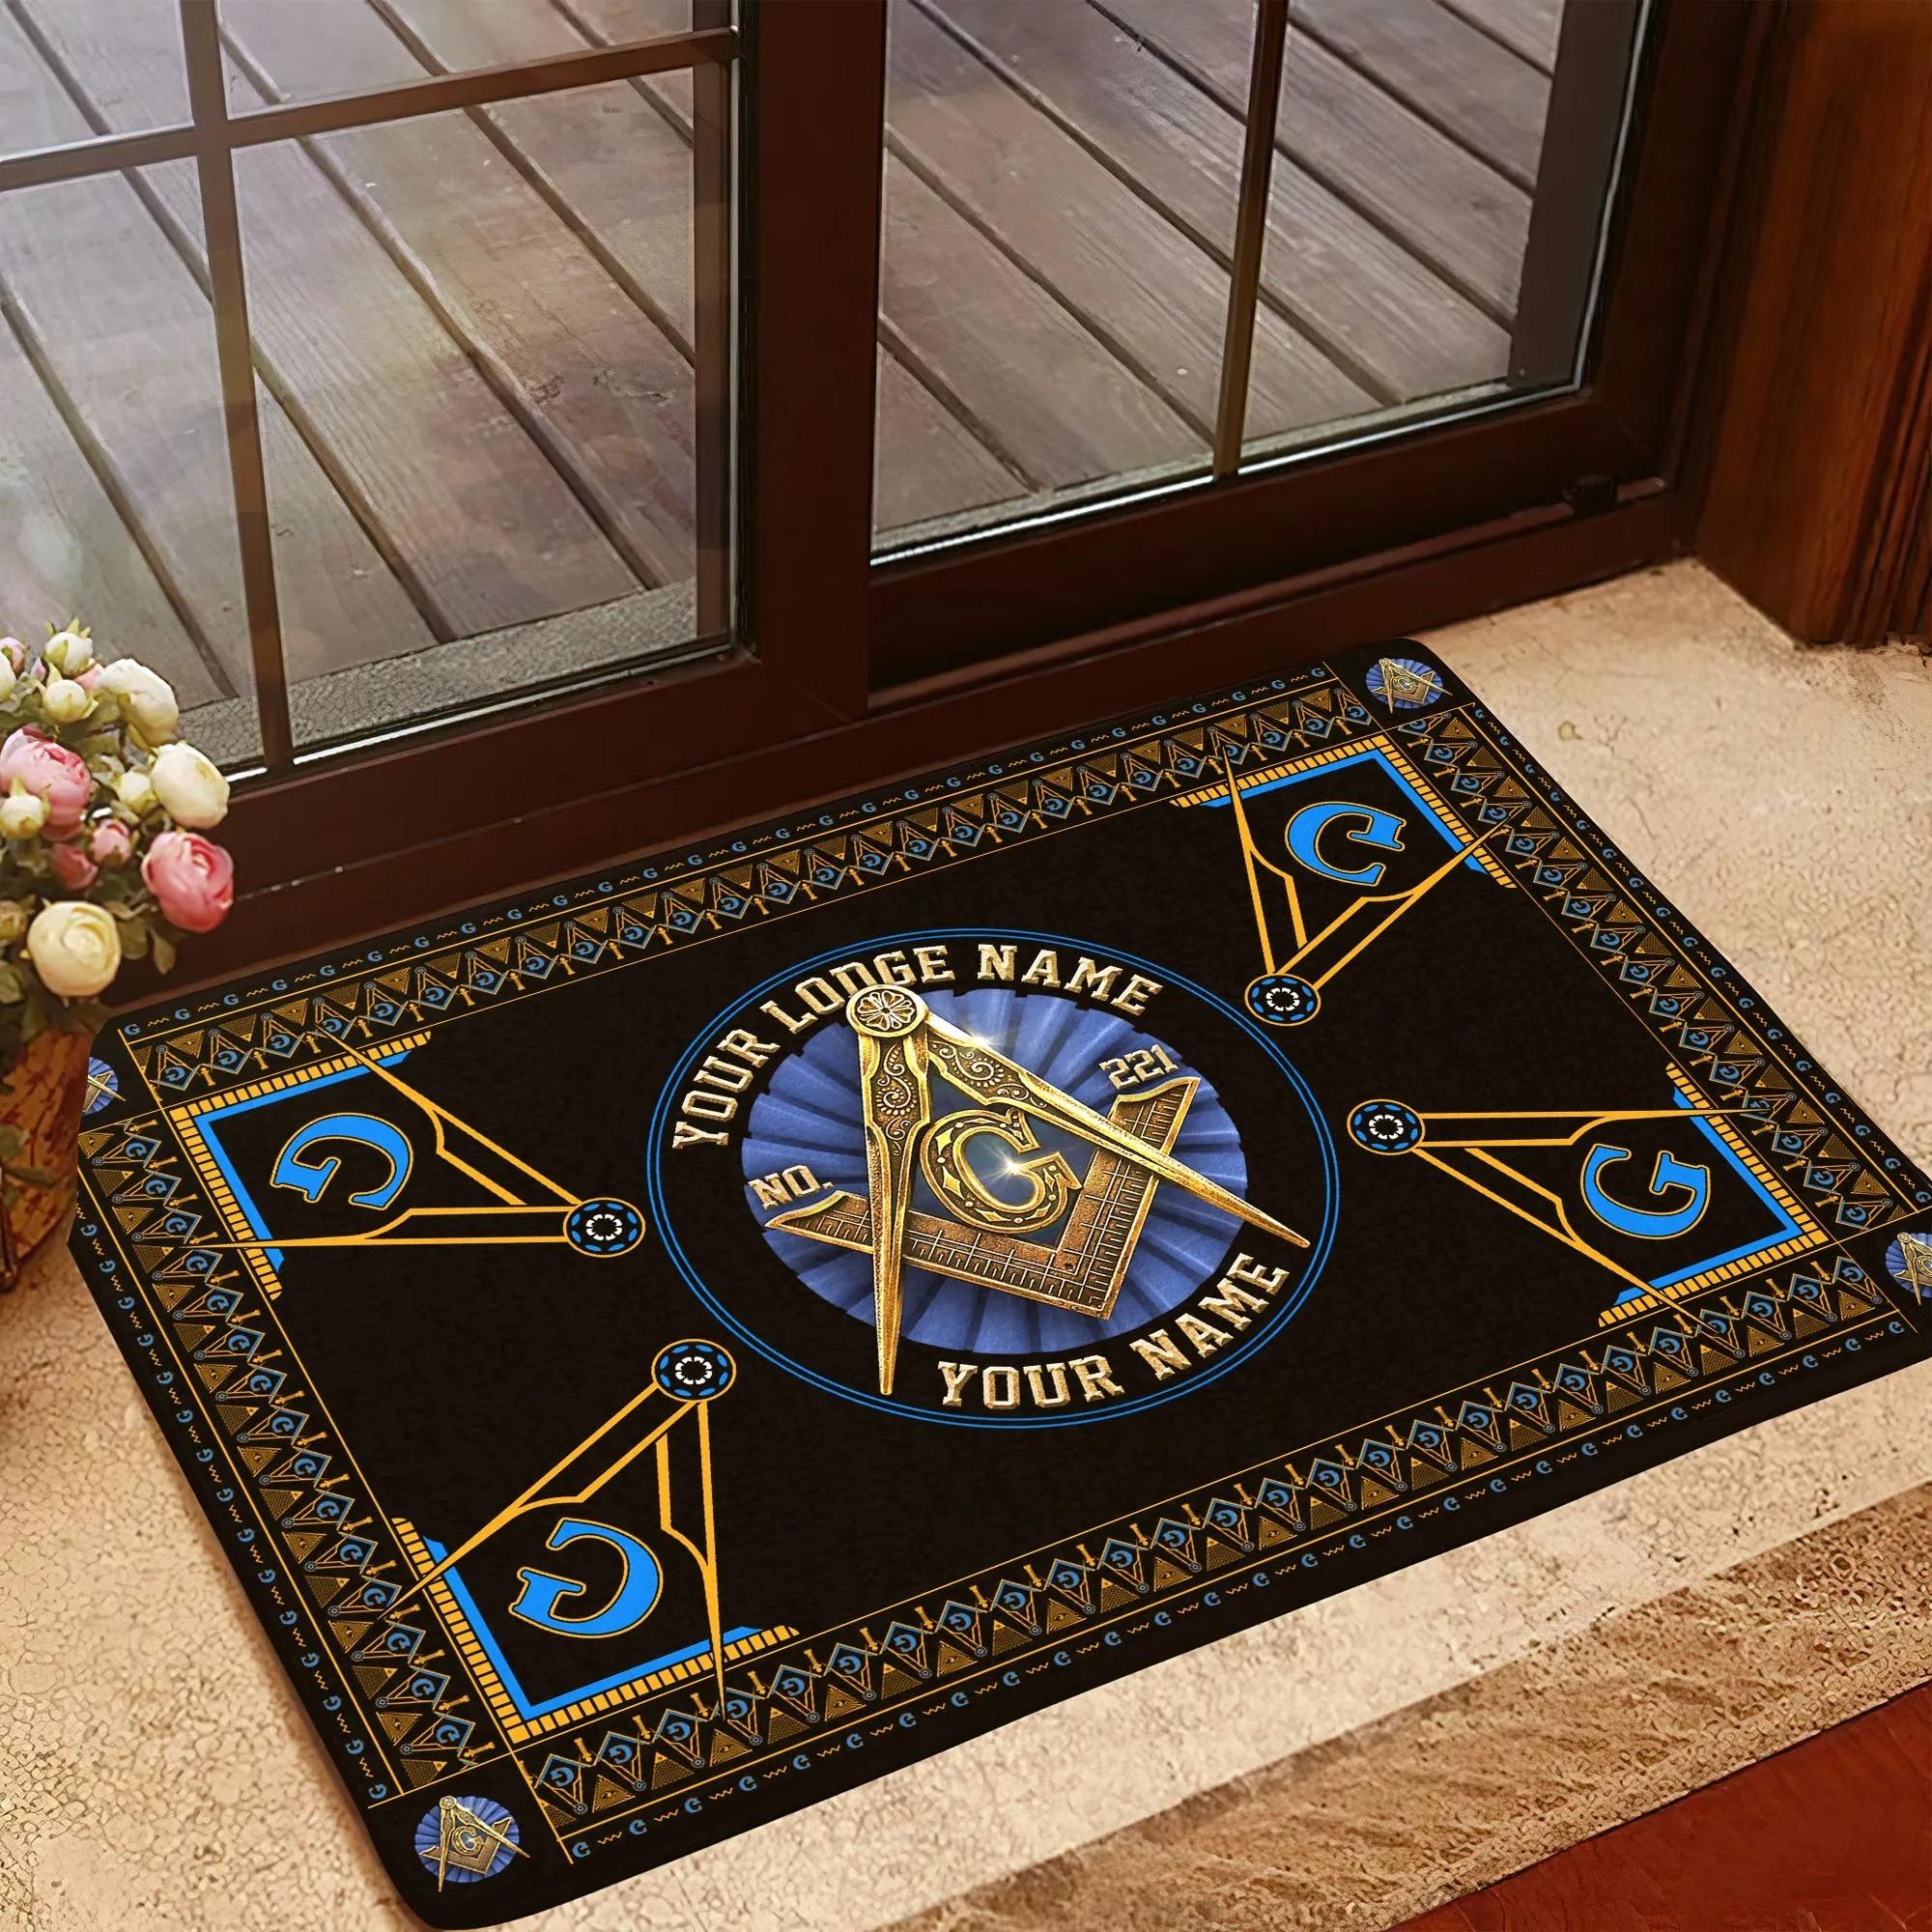 Freemasonry masonic custom lodge name number doormat 2